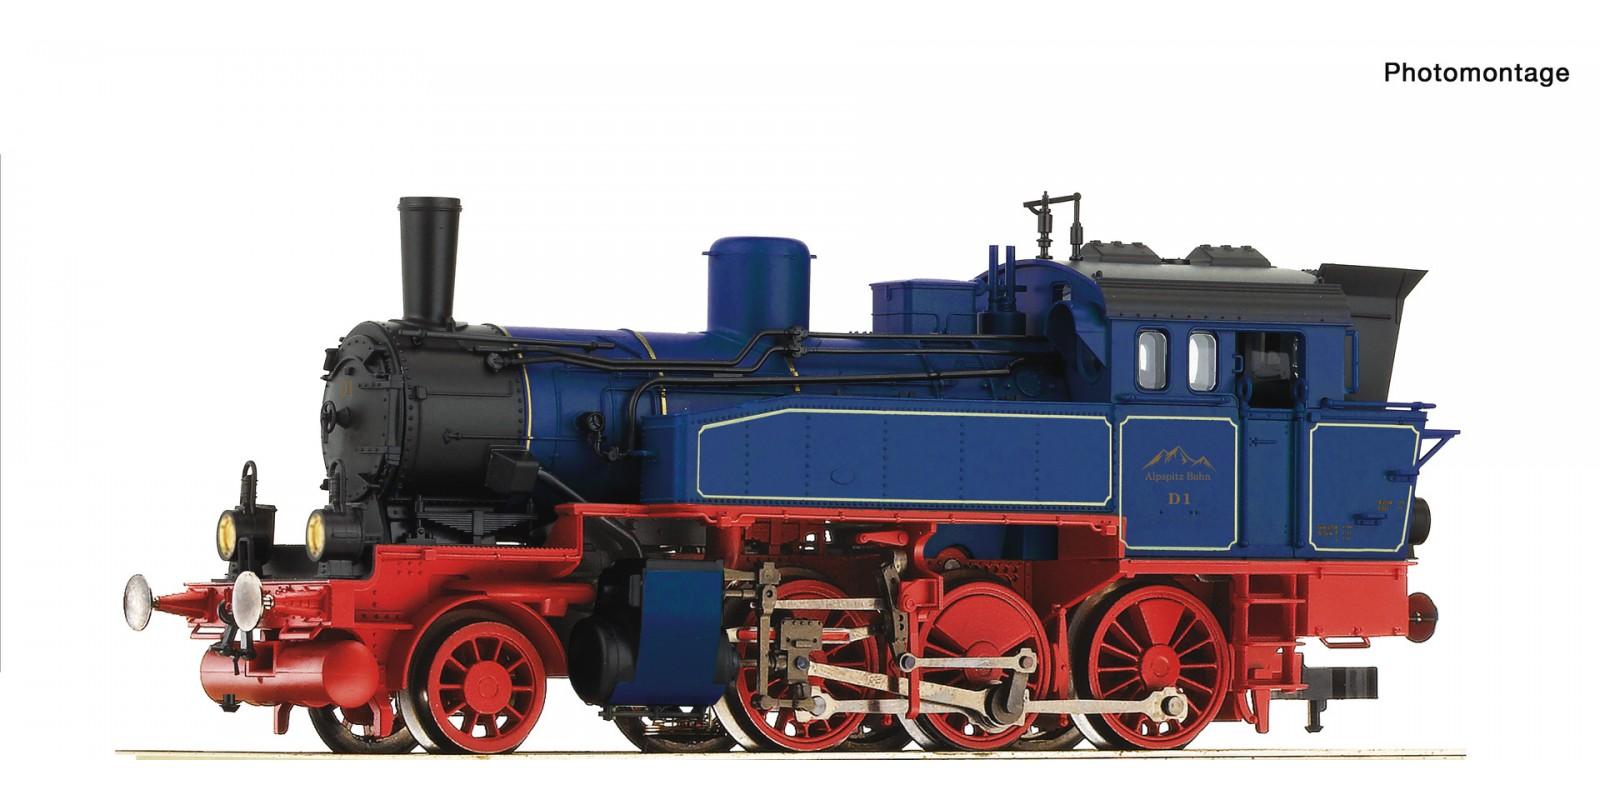 RO73159 Cogwheel steam locomotive